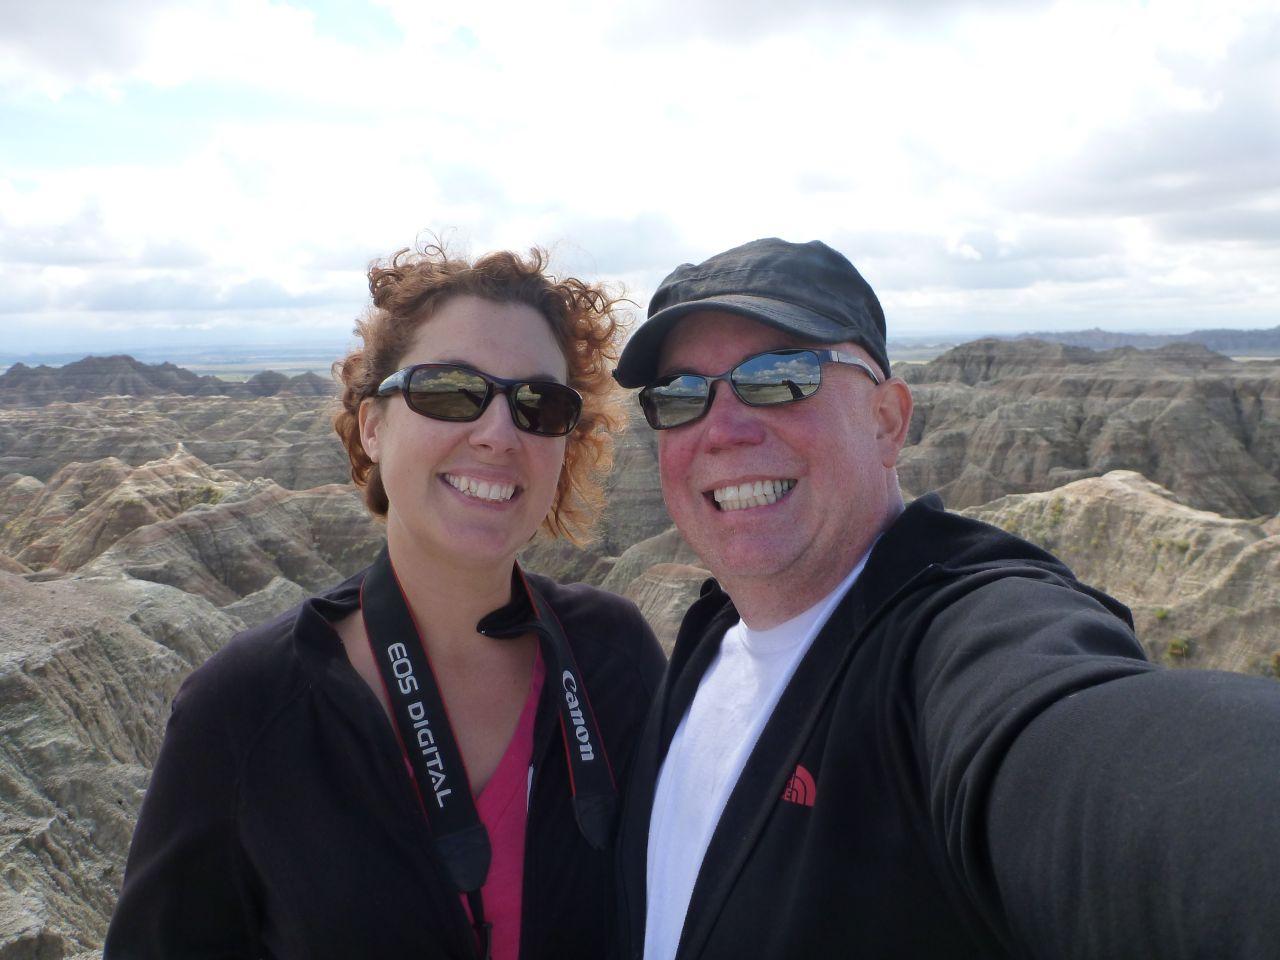 David and Brenda At The Badlands In South Dakota